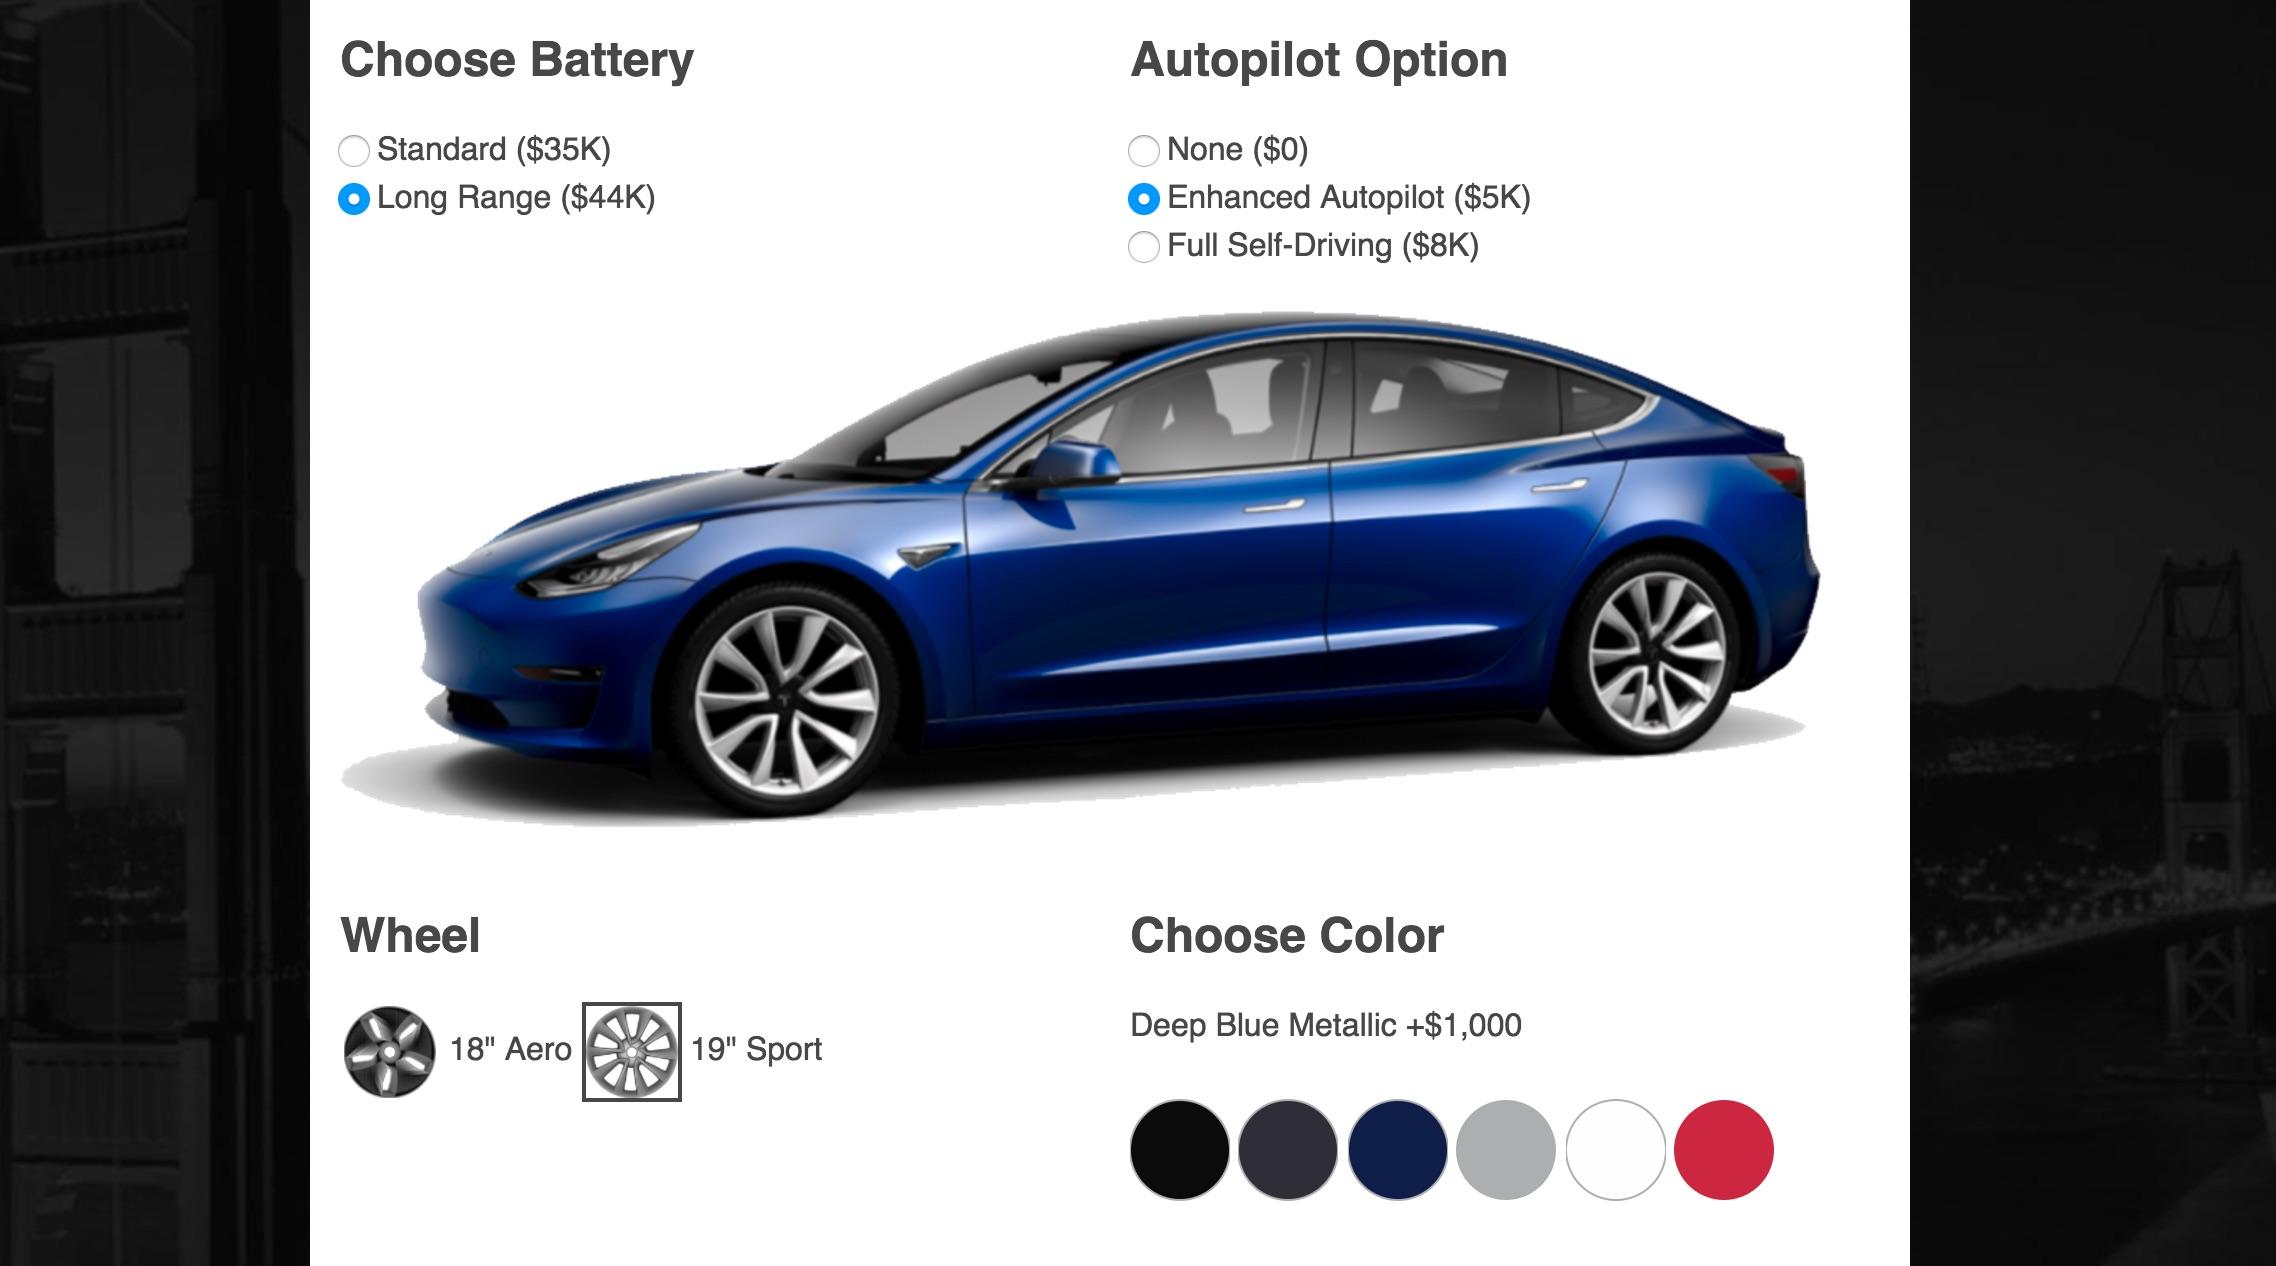 Tesla Model 3 Cost Estimator Computes Actual Cost After